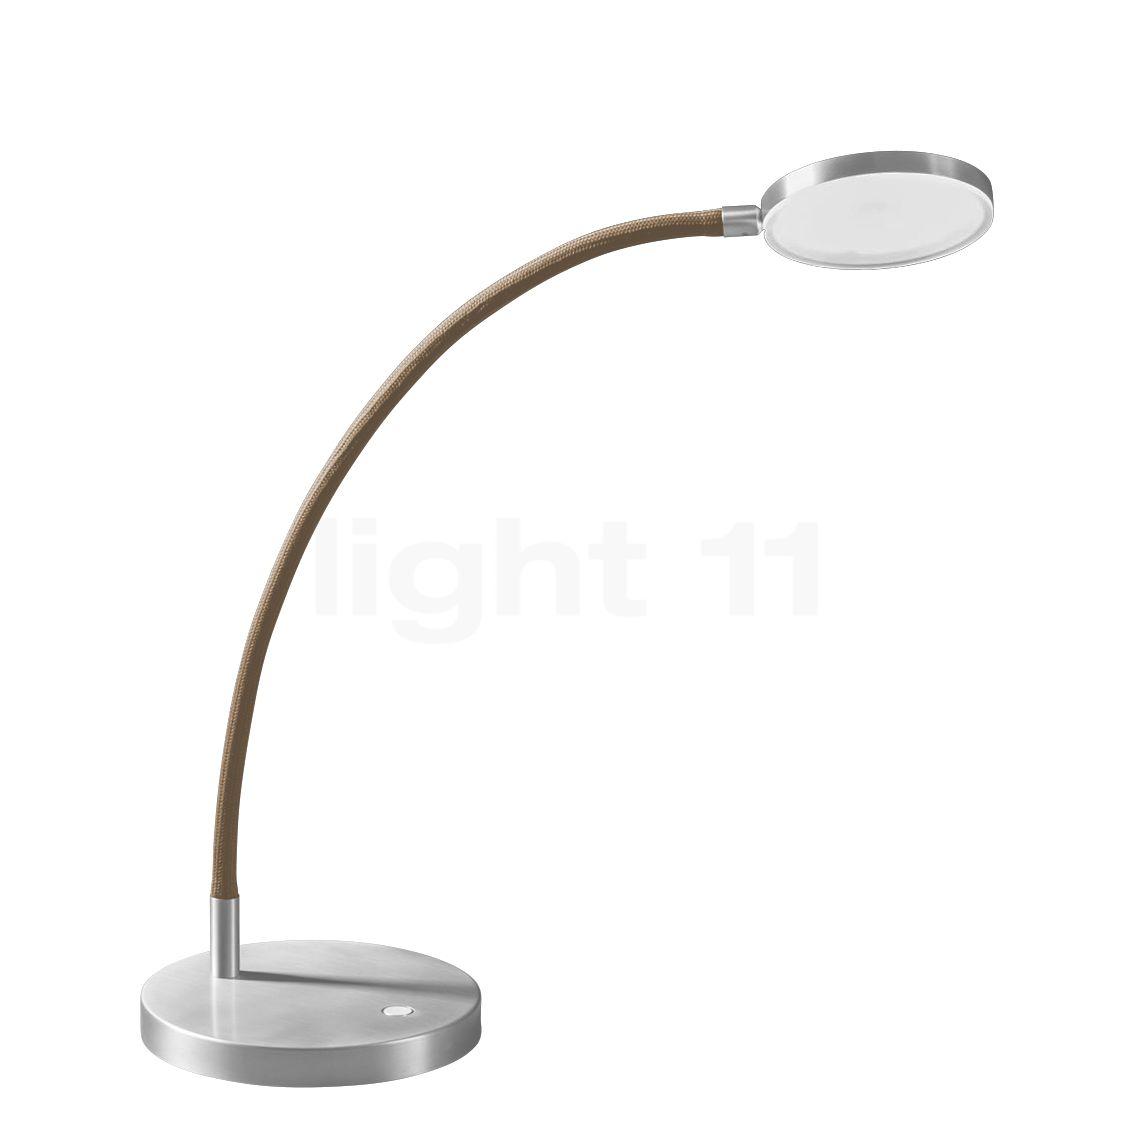 holtkoetter floor lamp parts gurus floor. Black Bedroom Furniture Sets. Home Design Ideas